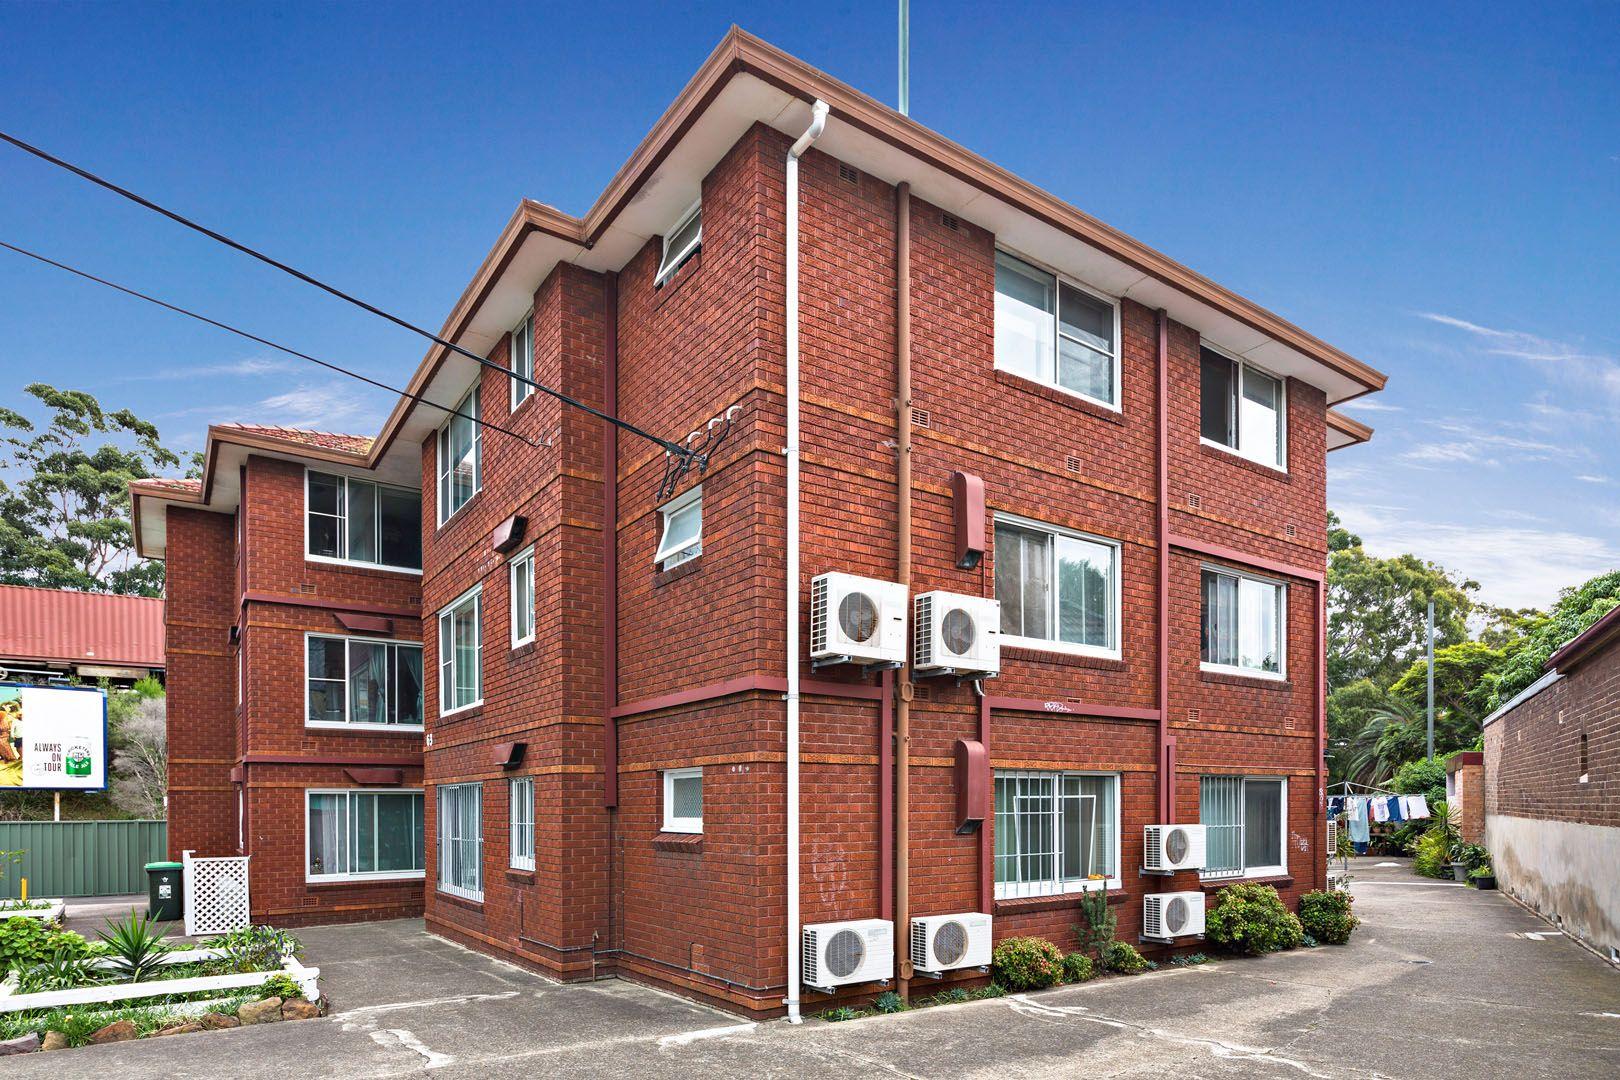 11/63 Unwins Bridge Road, Sydenham NSW 2044, Image 0